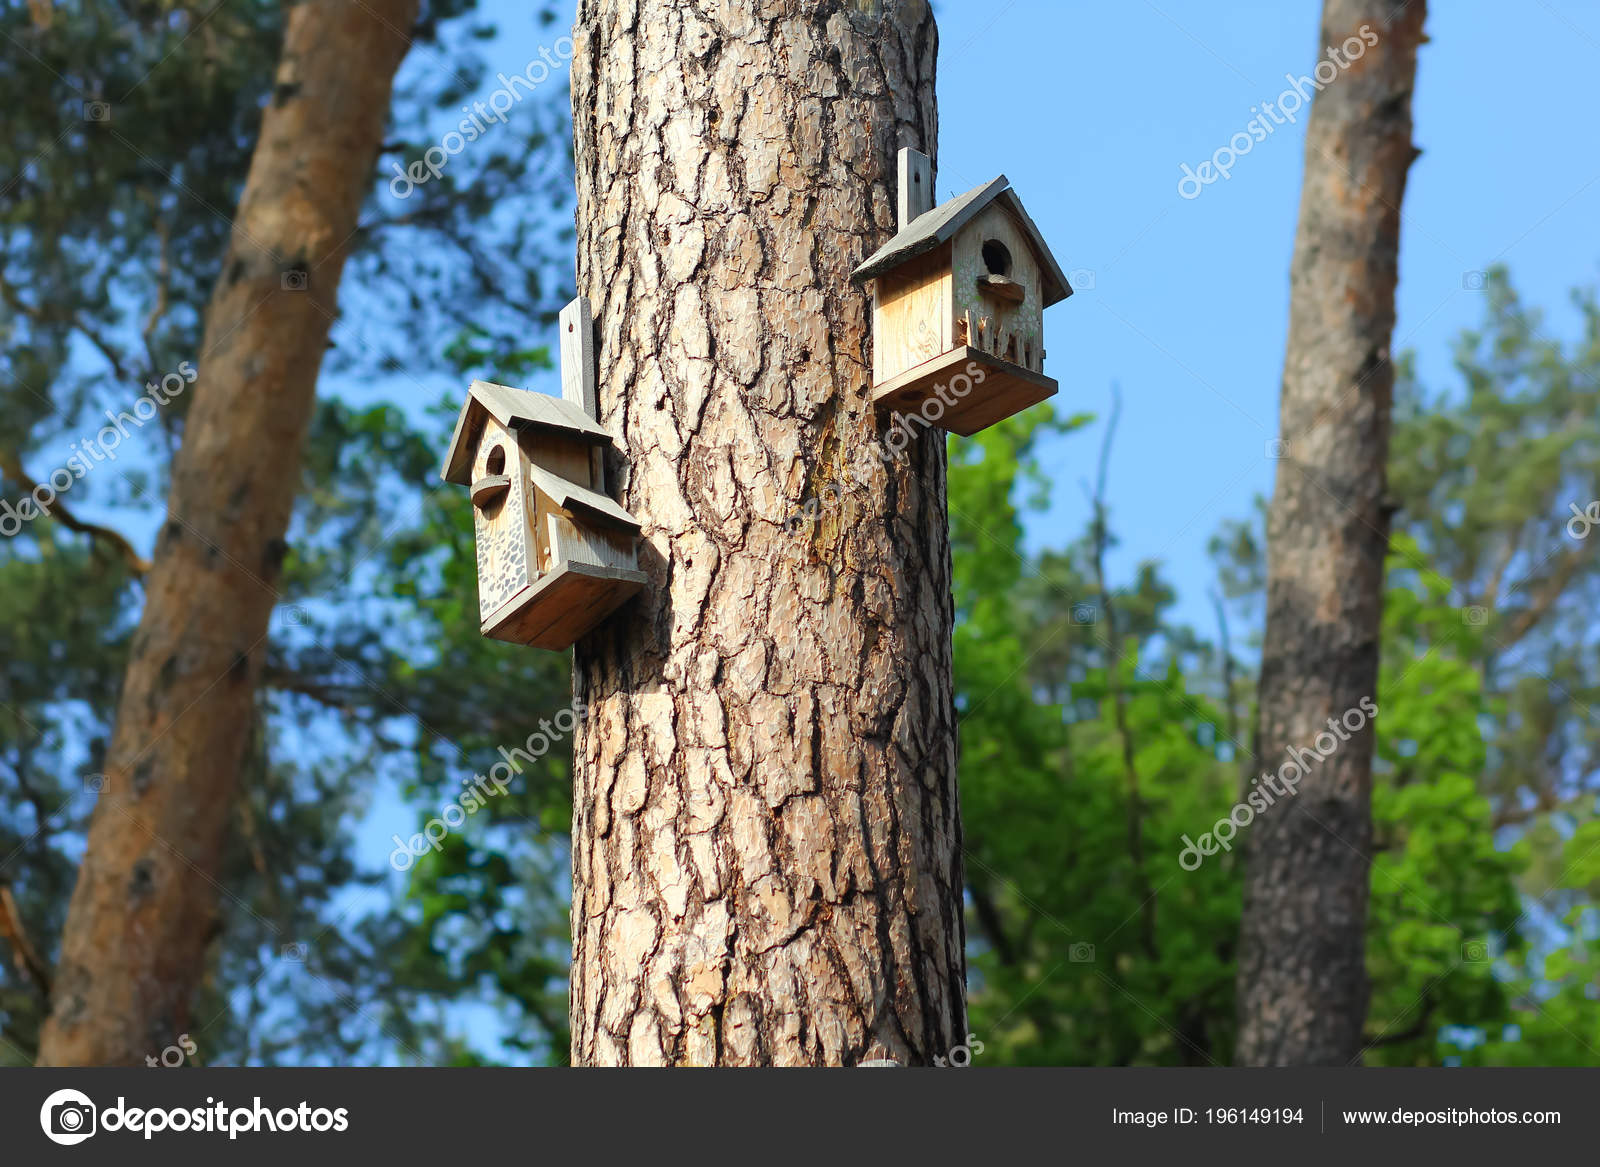 Terrific Diy Creative Hand Made Wooden Bird Houses Hanging Pine Tree Download Free Architecture Designs Scobabritishbridgeorg